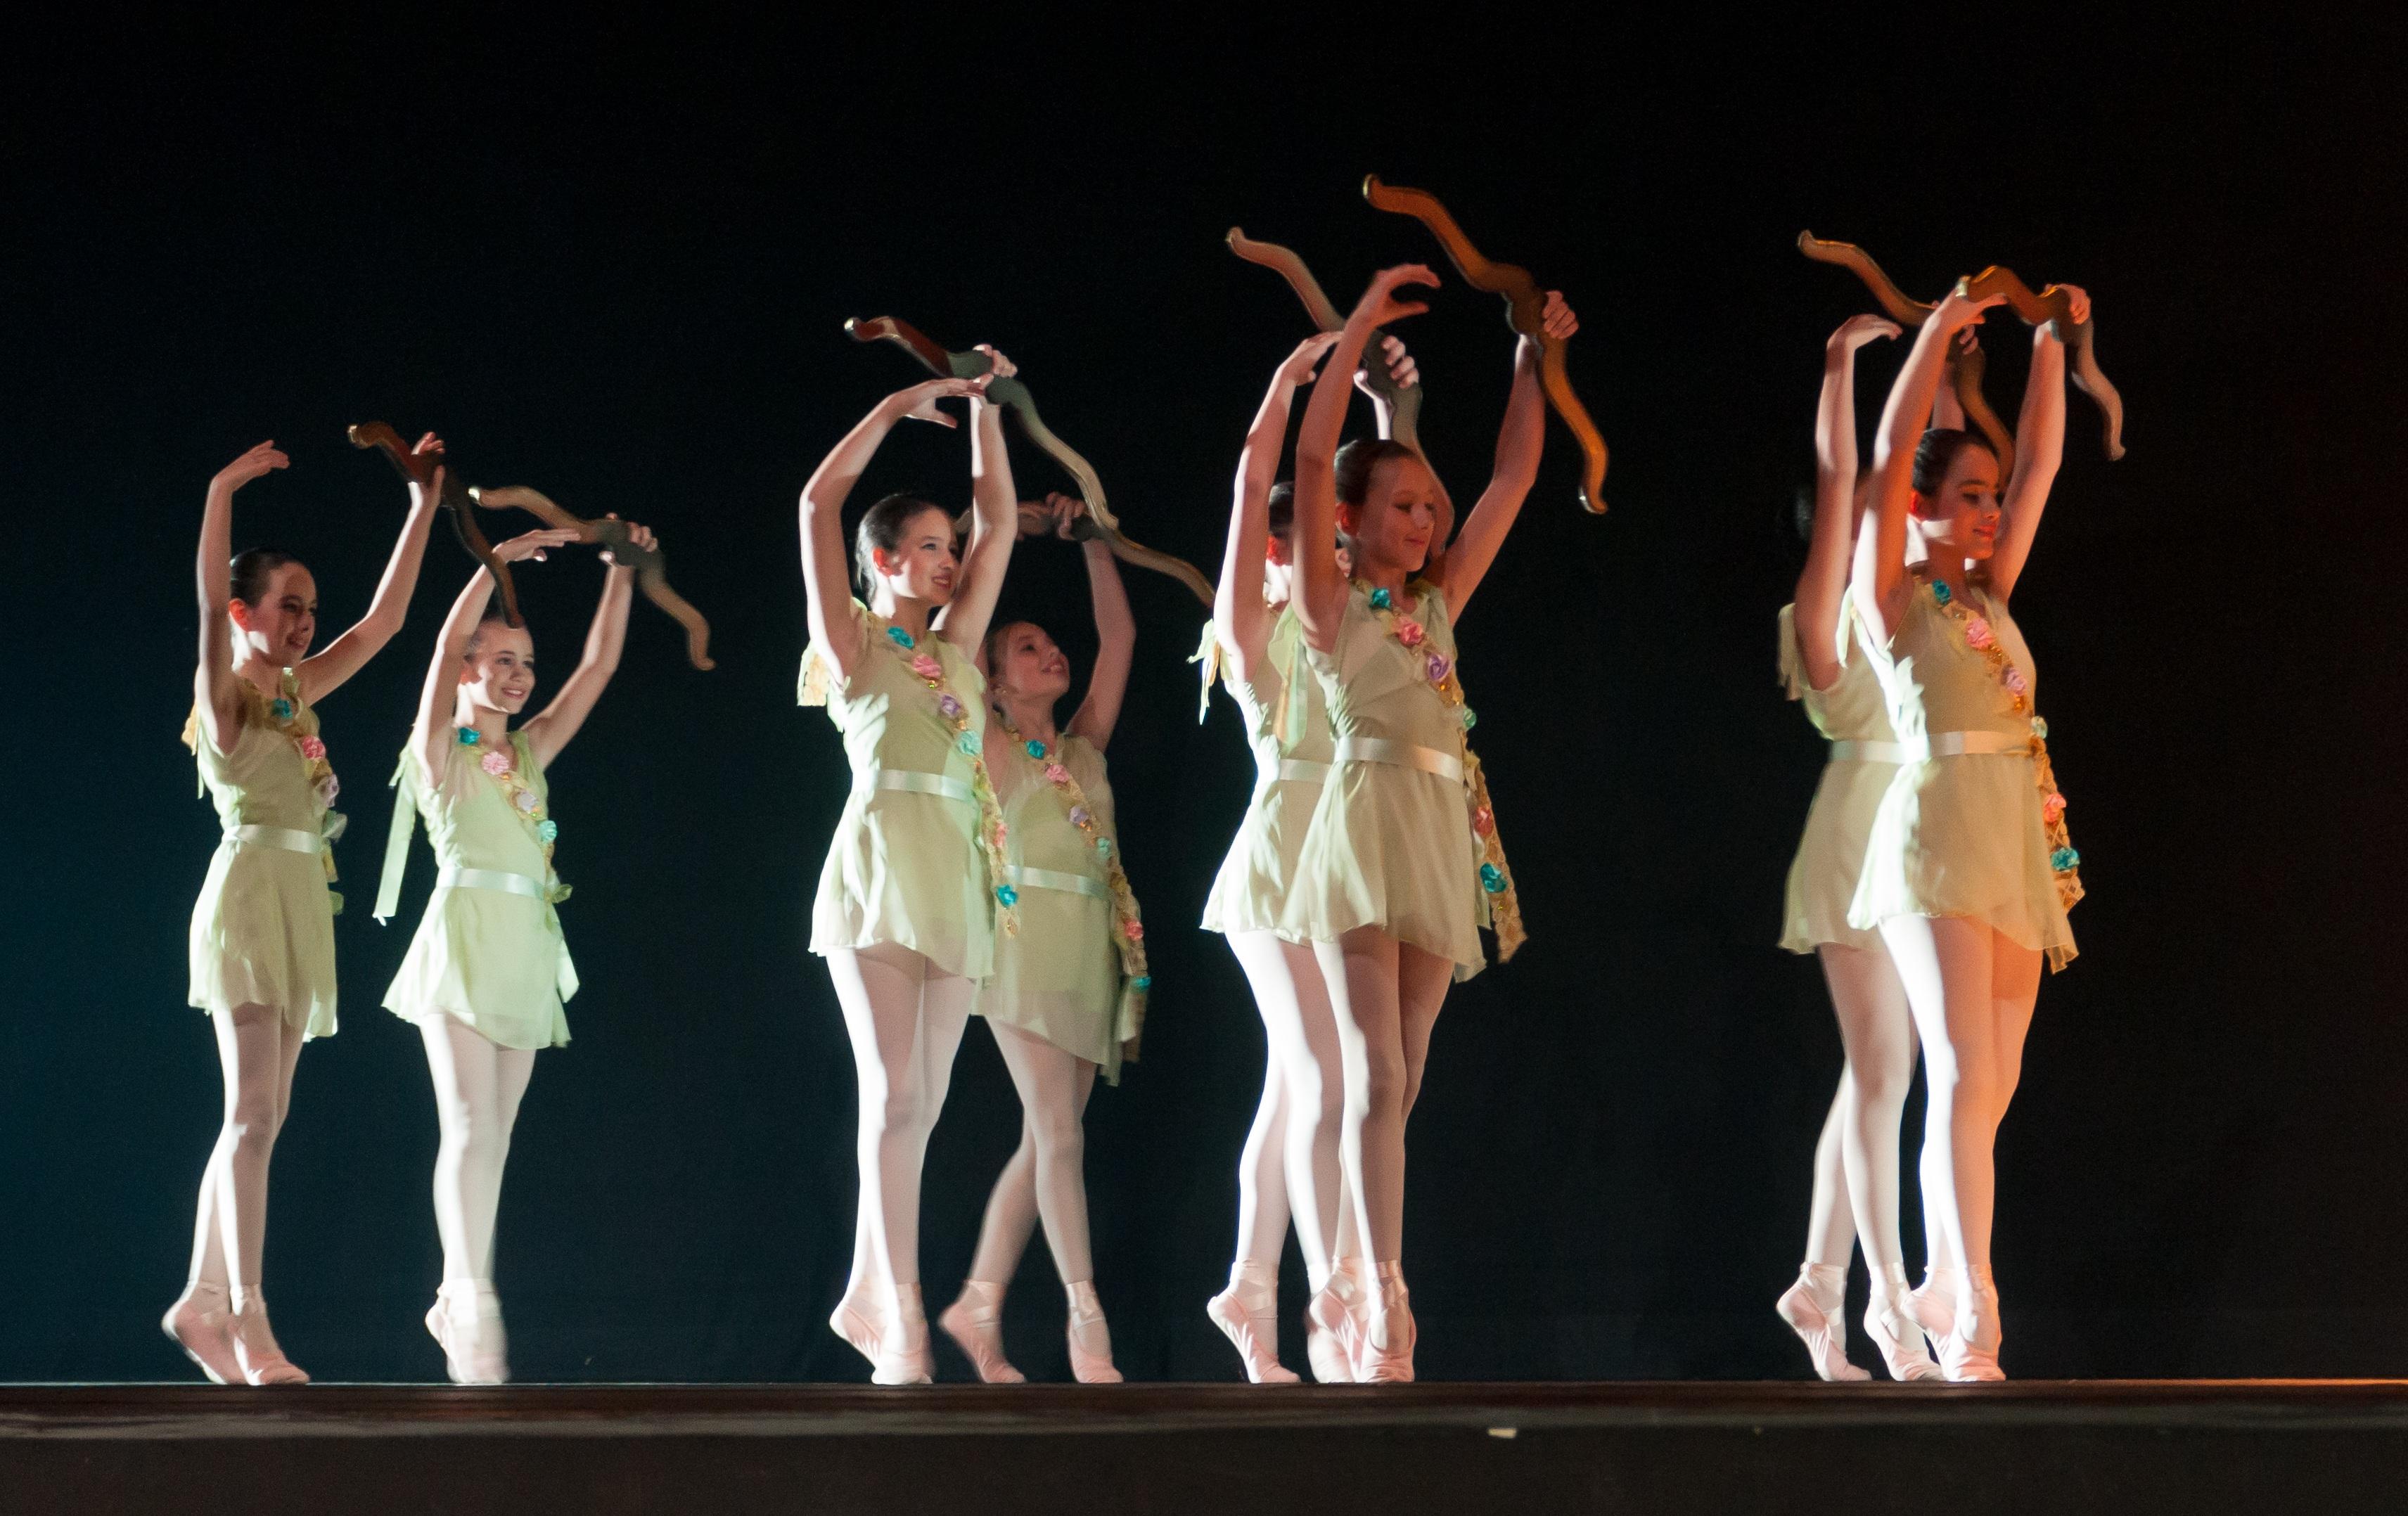 stockvault-ballet-dancers201469